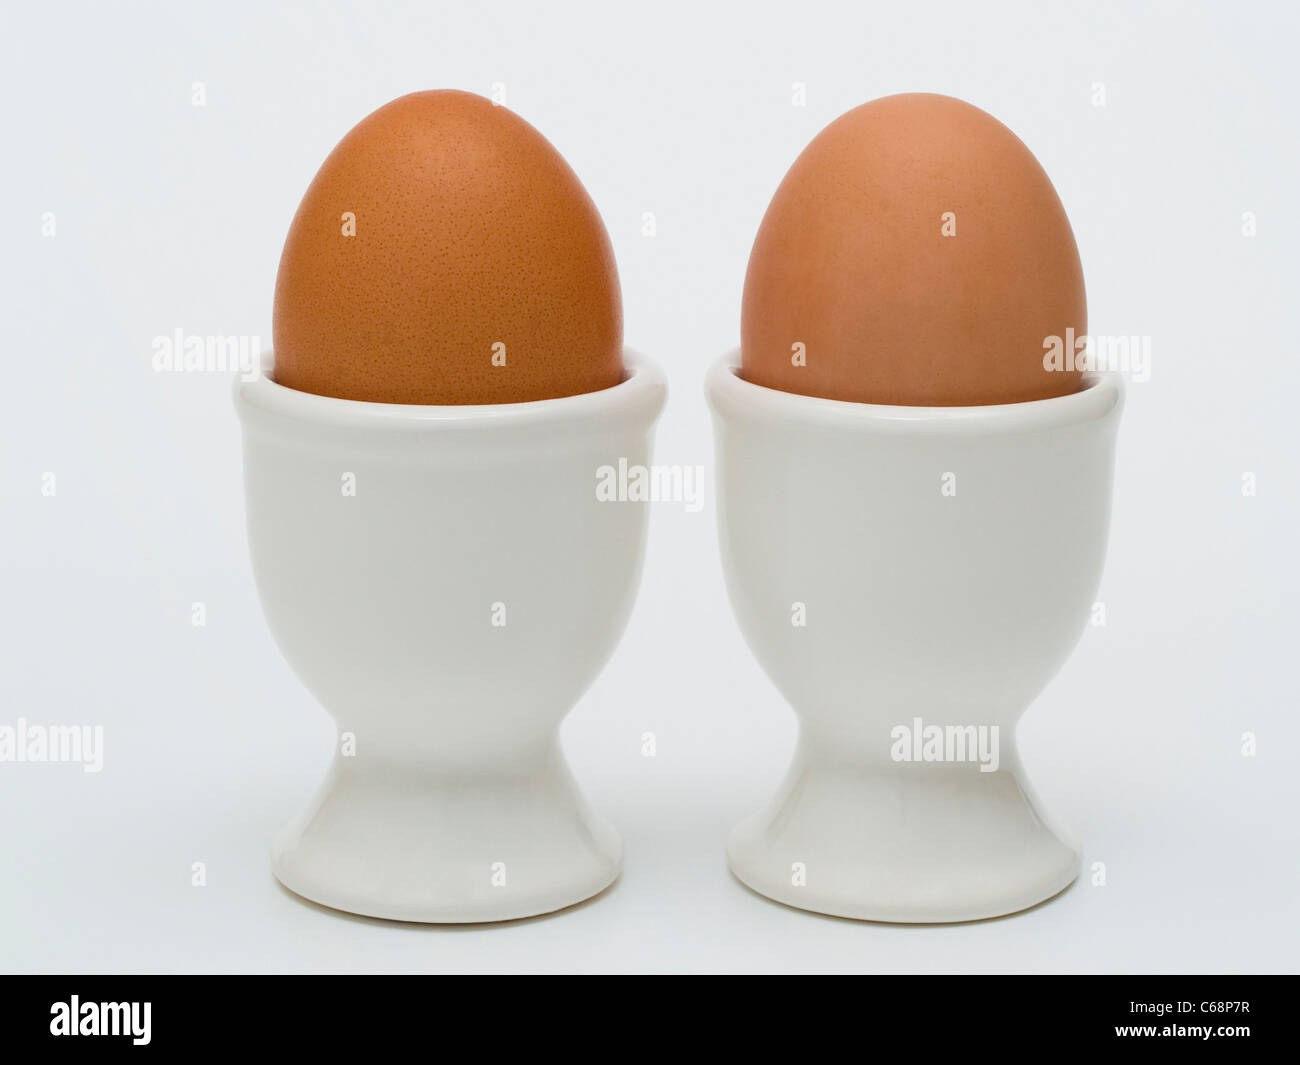 zwei braunes Hühnereier stehen in Eierbechern | two eggcups with two brown hen's eggs - Stock Image